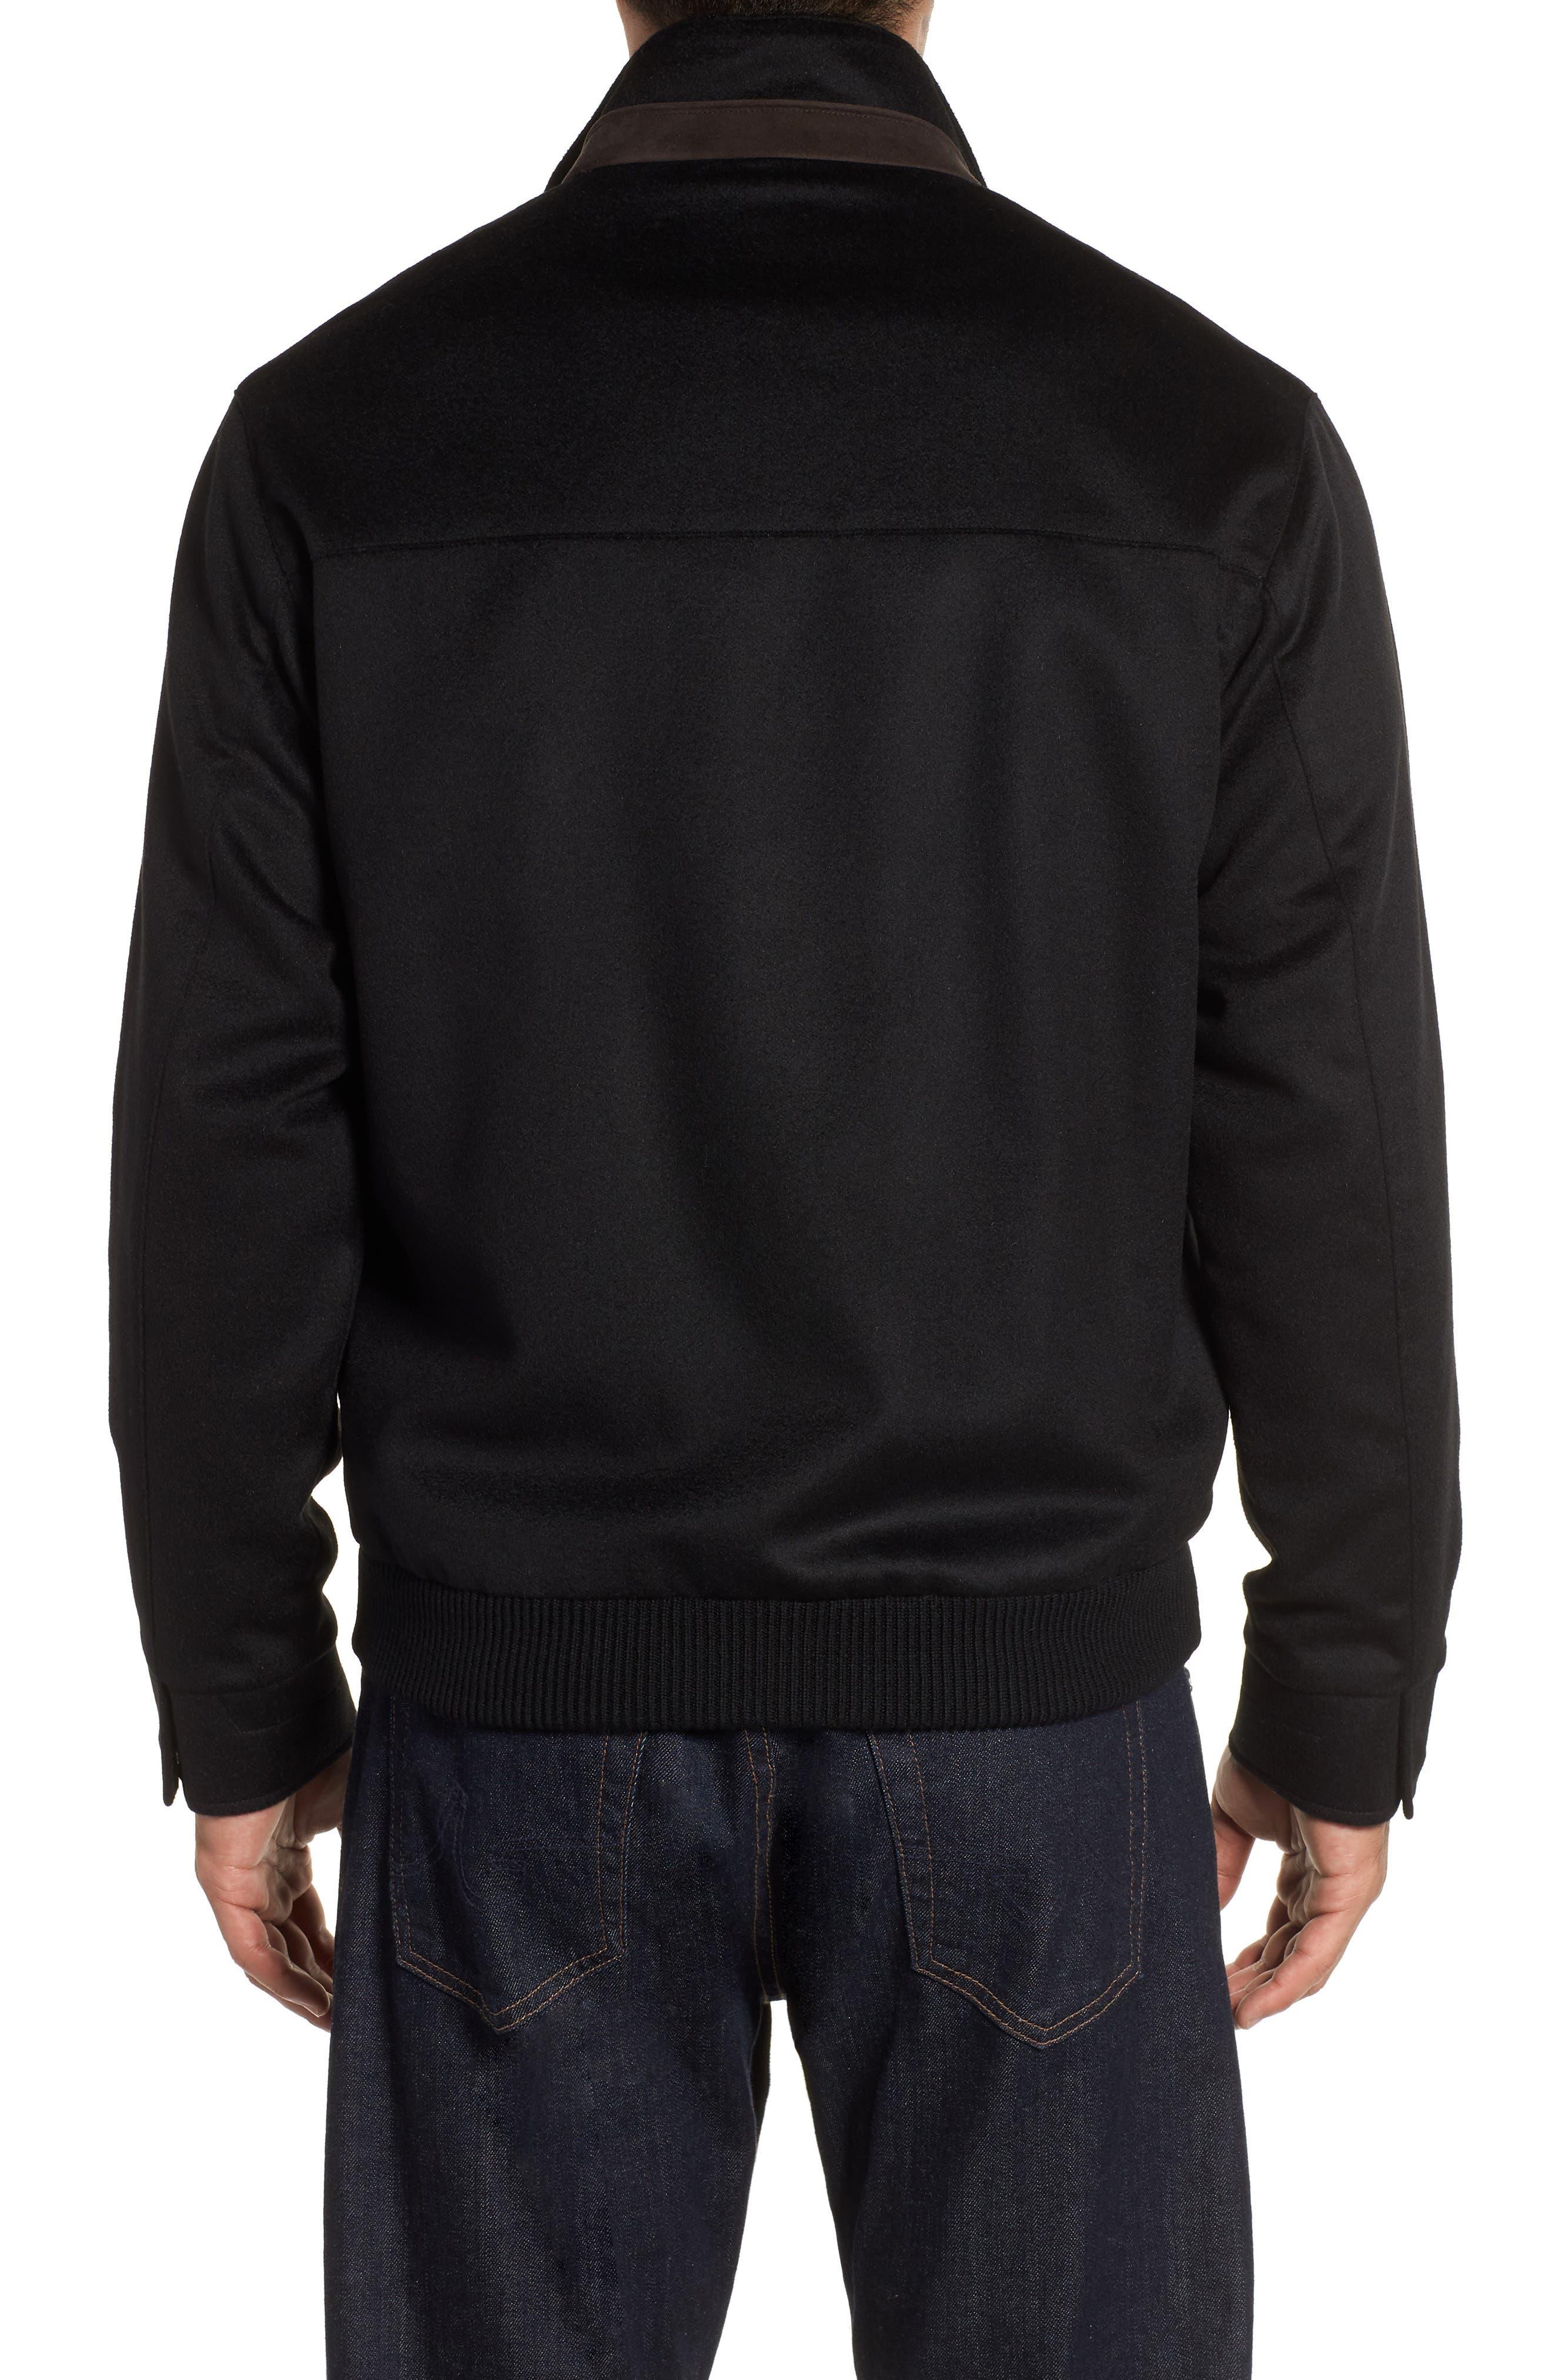 Westport Crown Wool & Cashmere Jacket,                             Alternate thumbnail 2, color,                             001